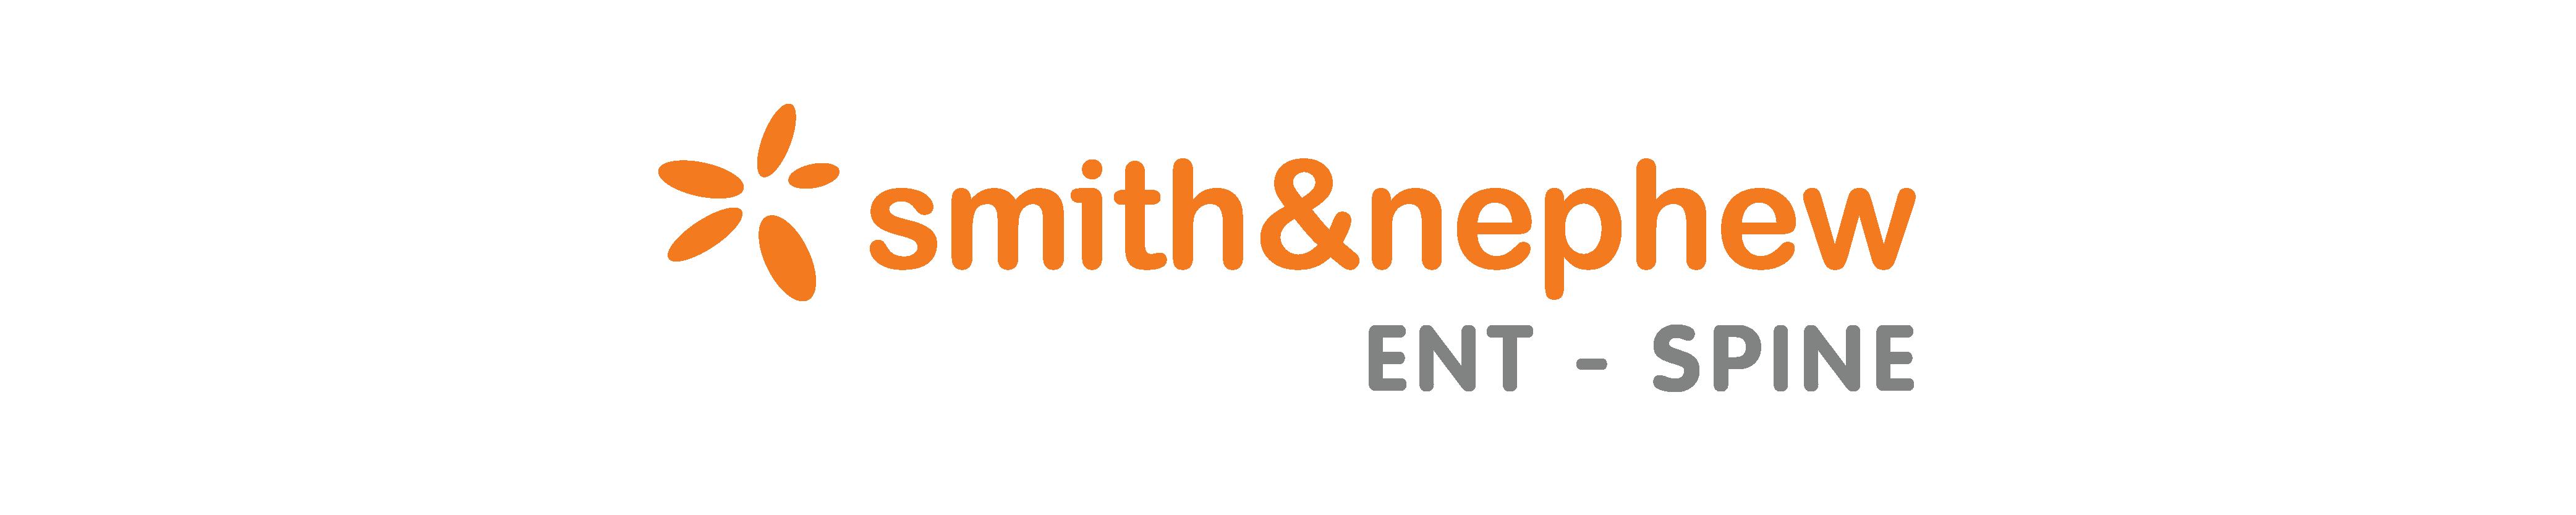 smithnephew-logo-artrolife-01